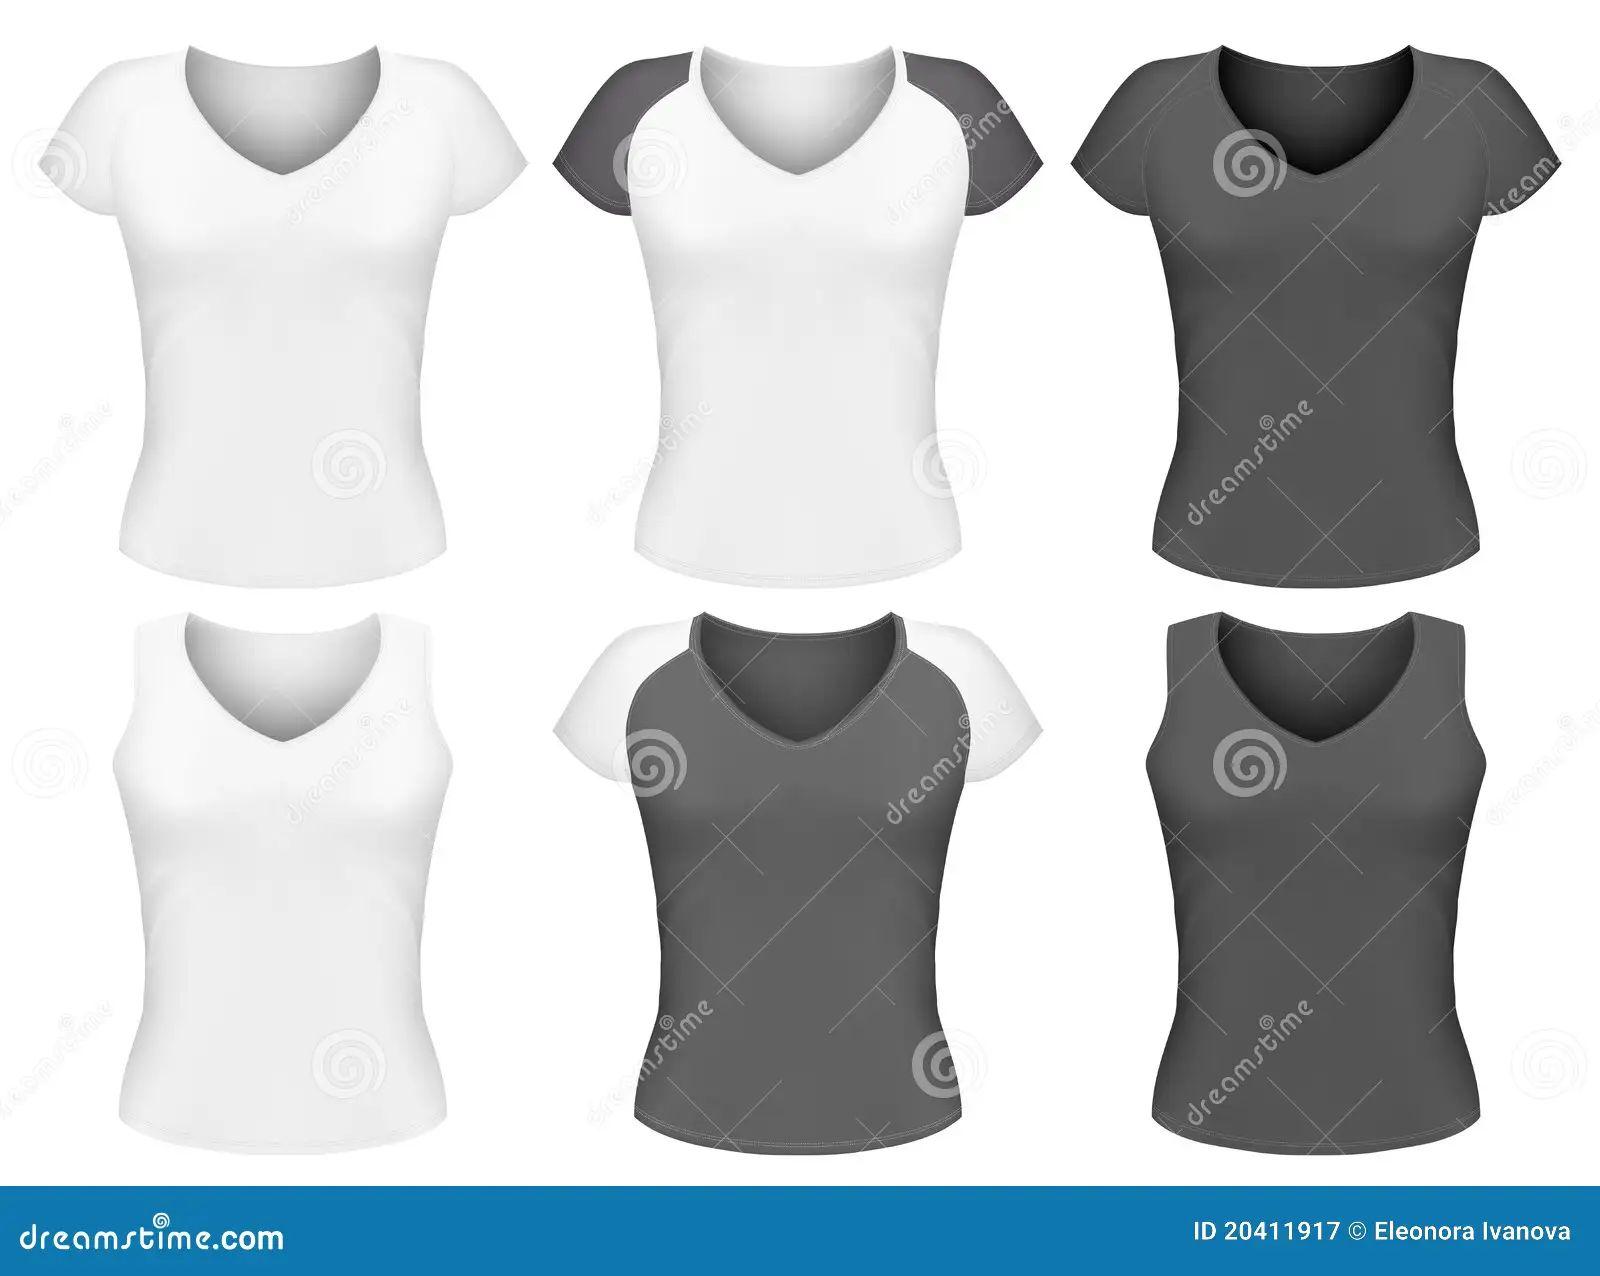 Design t shirt template free - Black T Shirt Design Template Free Download T Shirt Design Template Royalty Free Stock Download